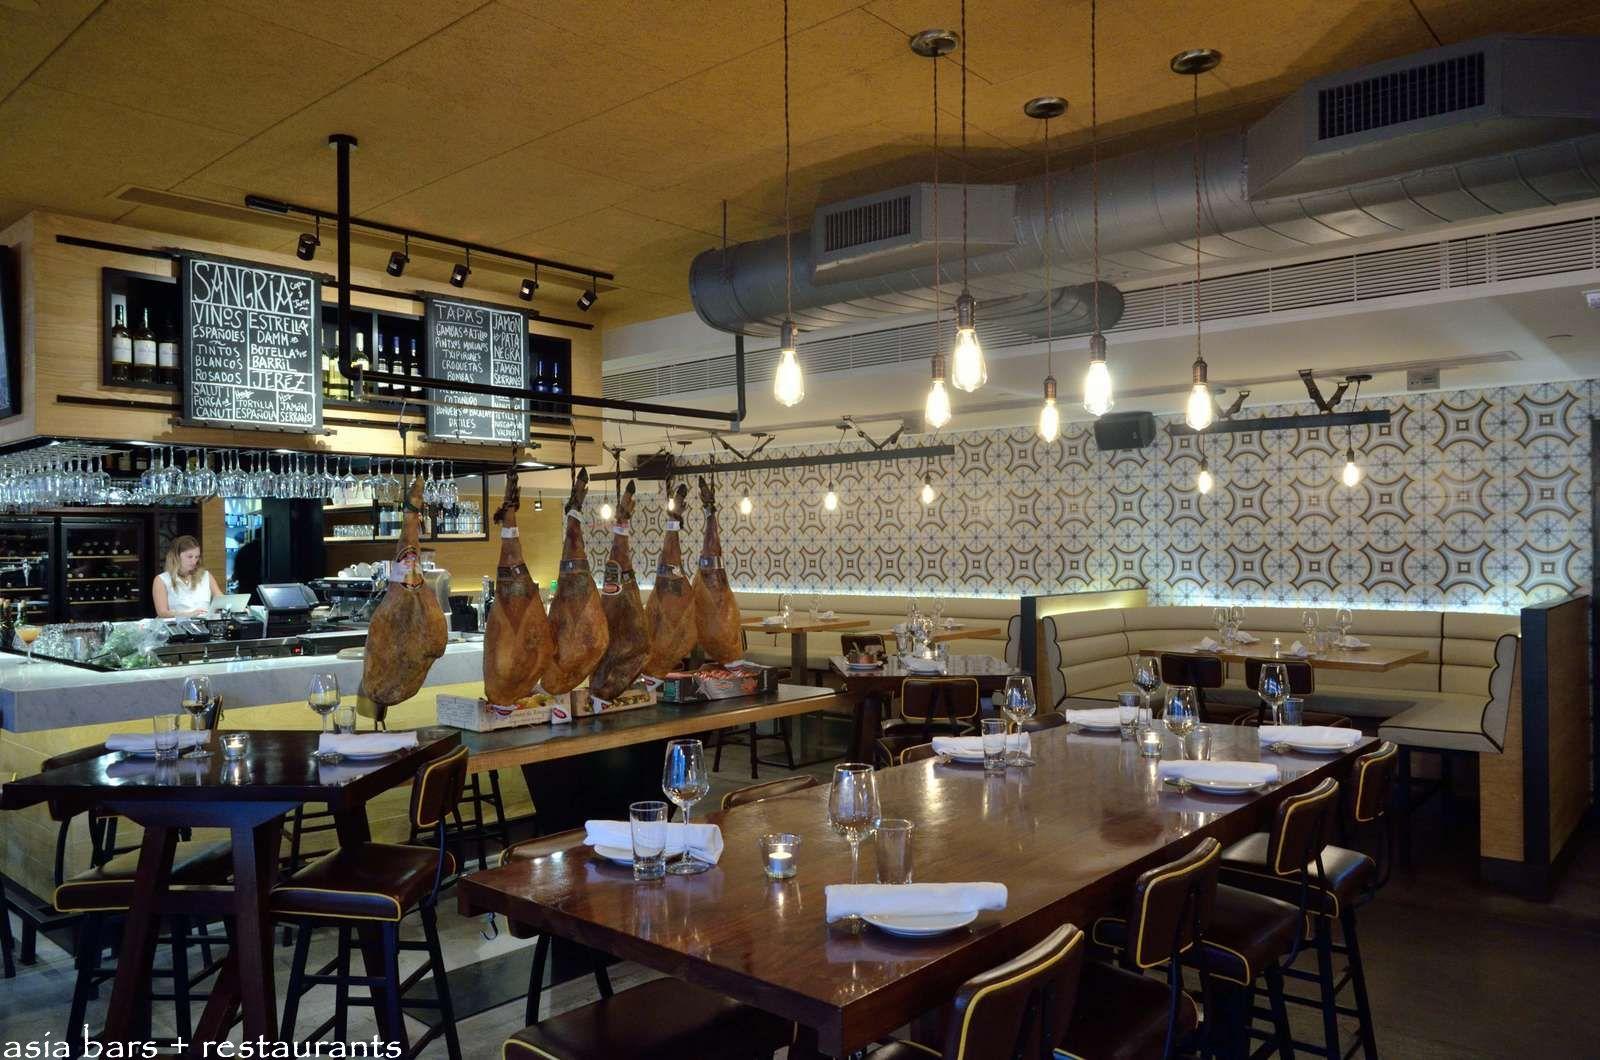 boqueria tapas bar restaurant hong kong asia bars restaurants. Black Bedroom Furniture Sets. Home Design Ideas